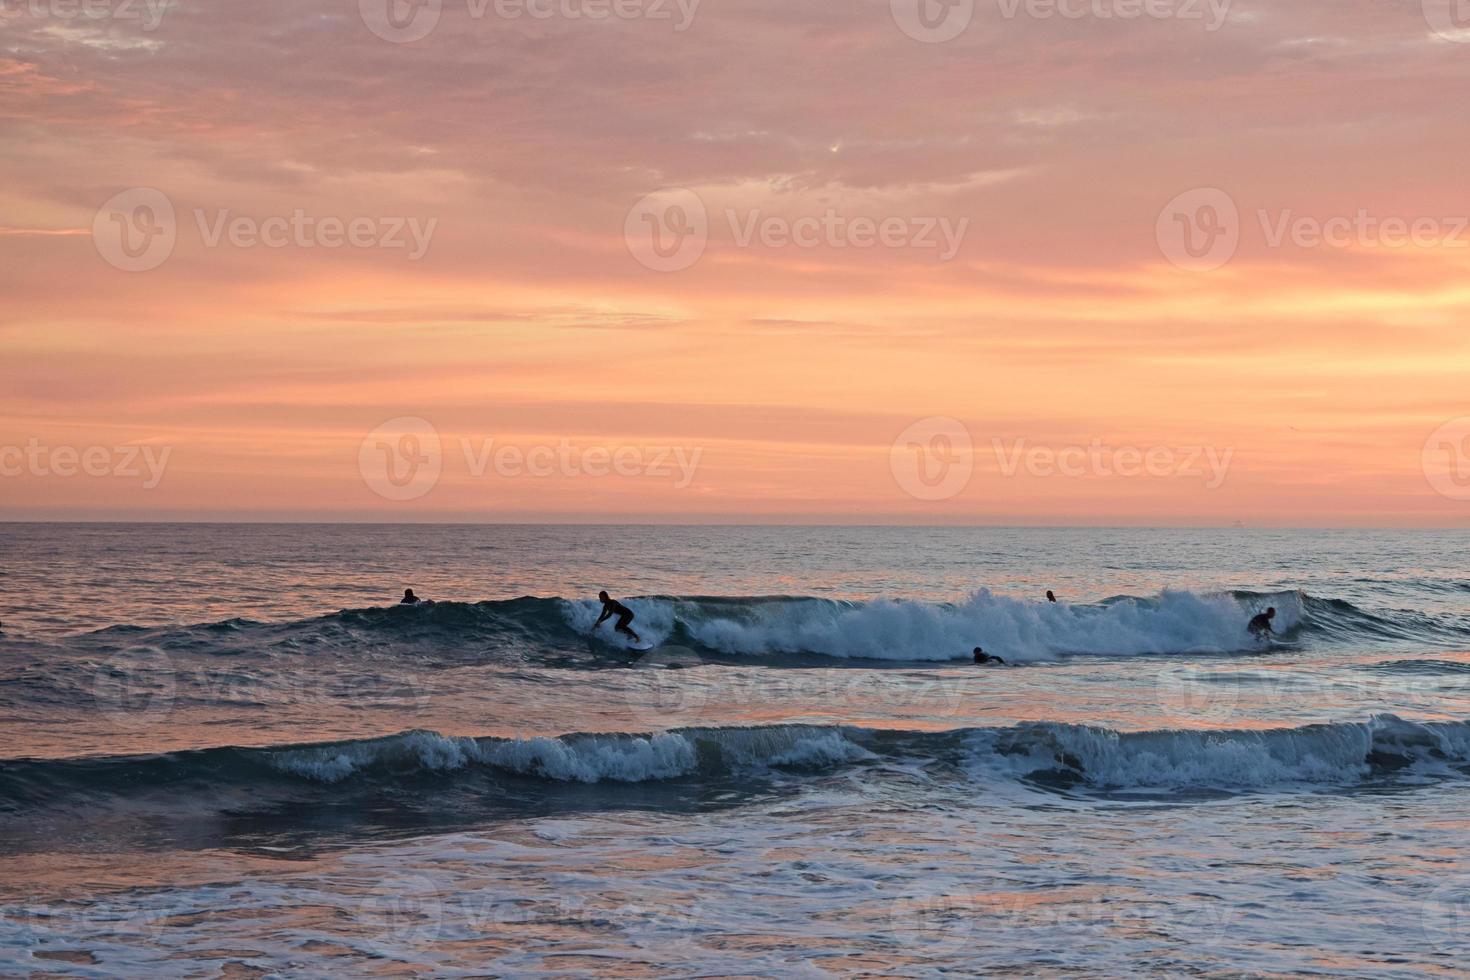 newport beach sommarsolnedgång foto